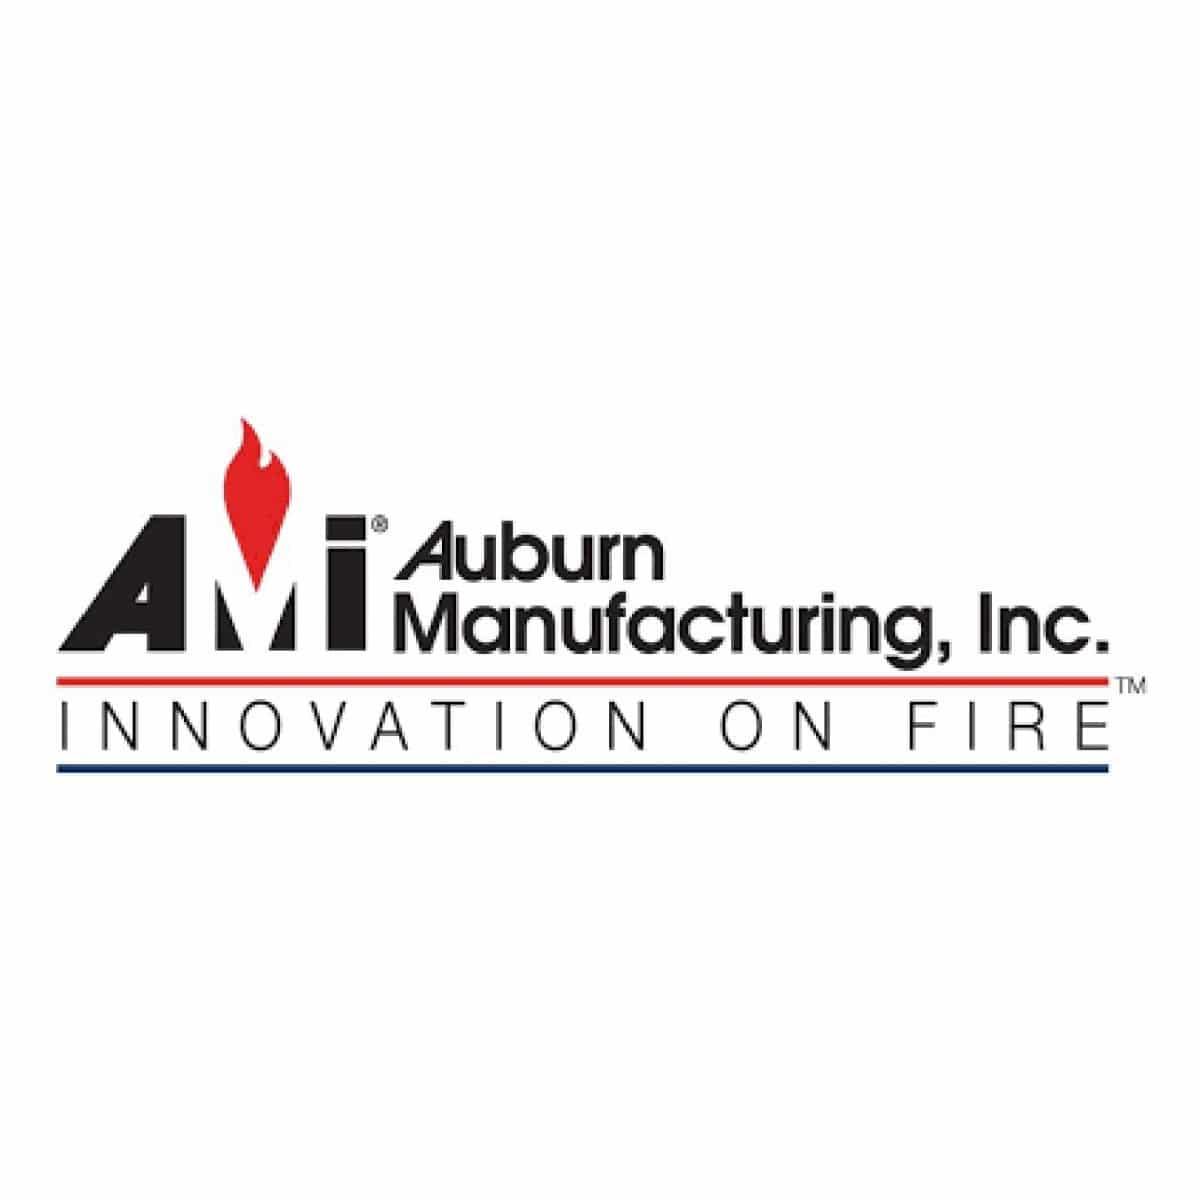 Auburn Manufacturing, Inc